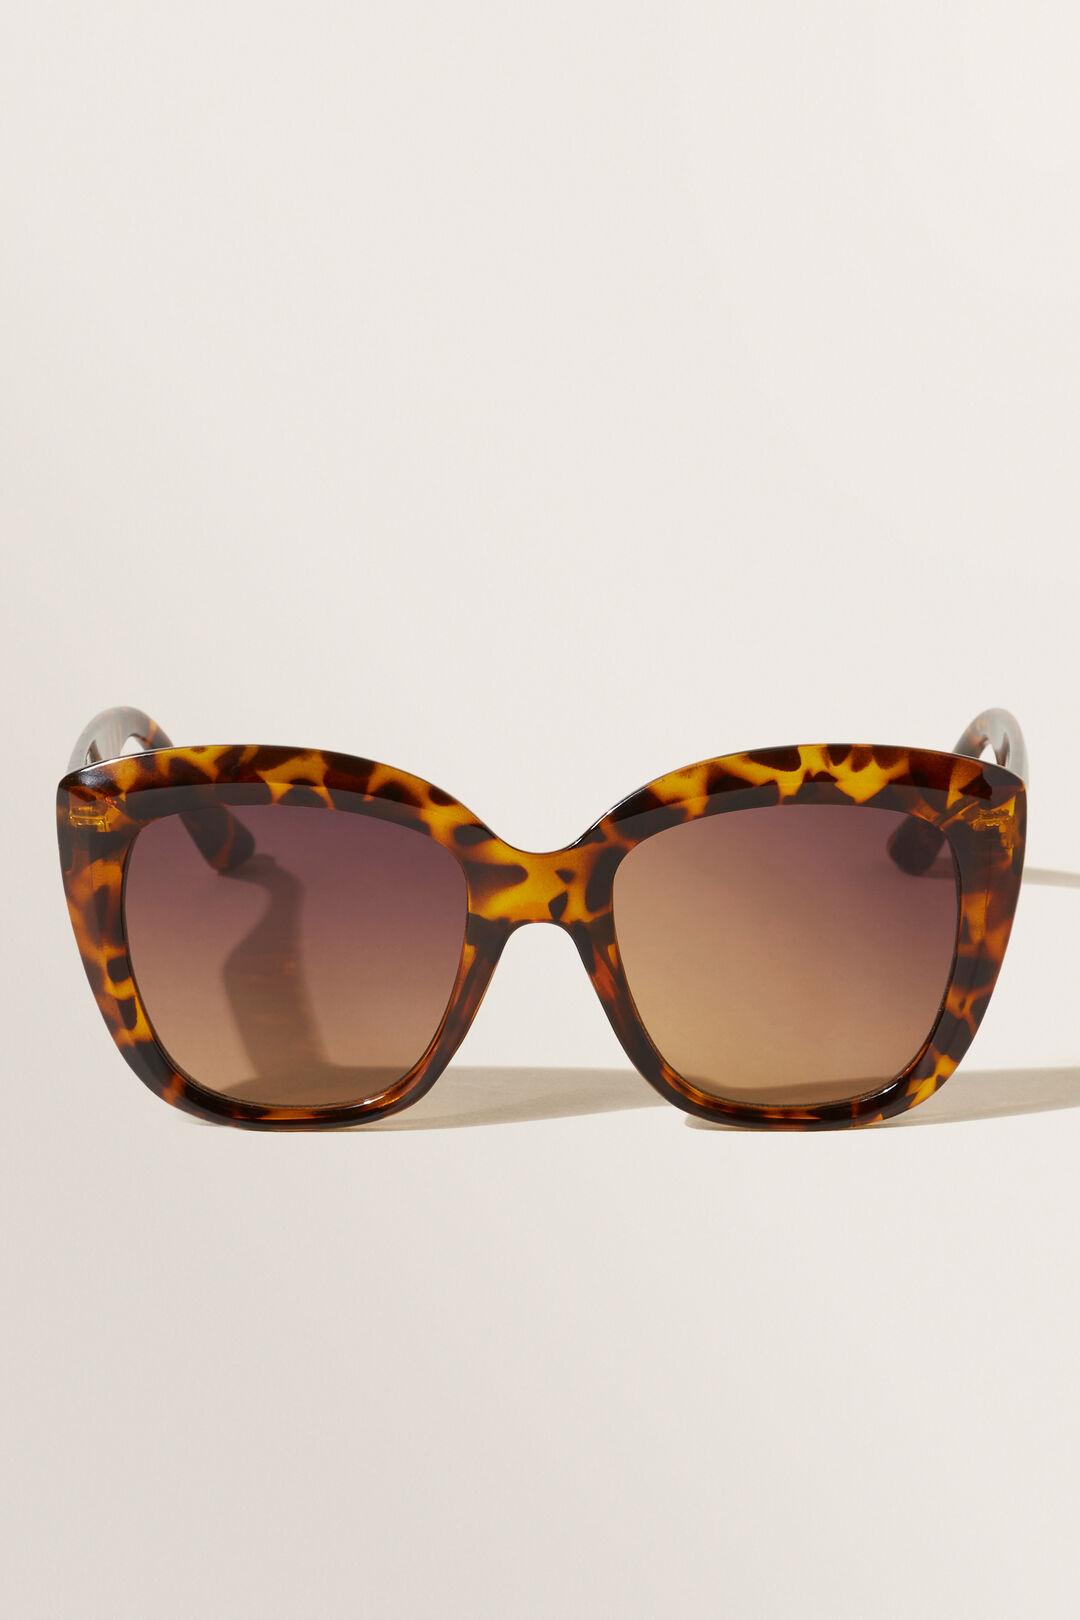 Bella Square Sunglasses  TORT  hi-res